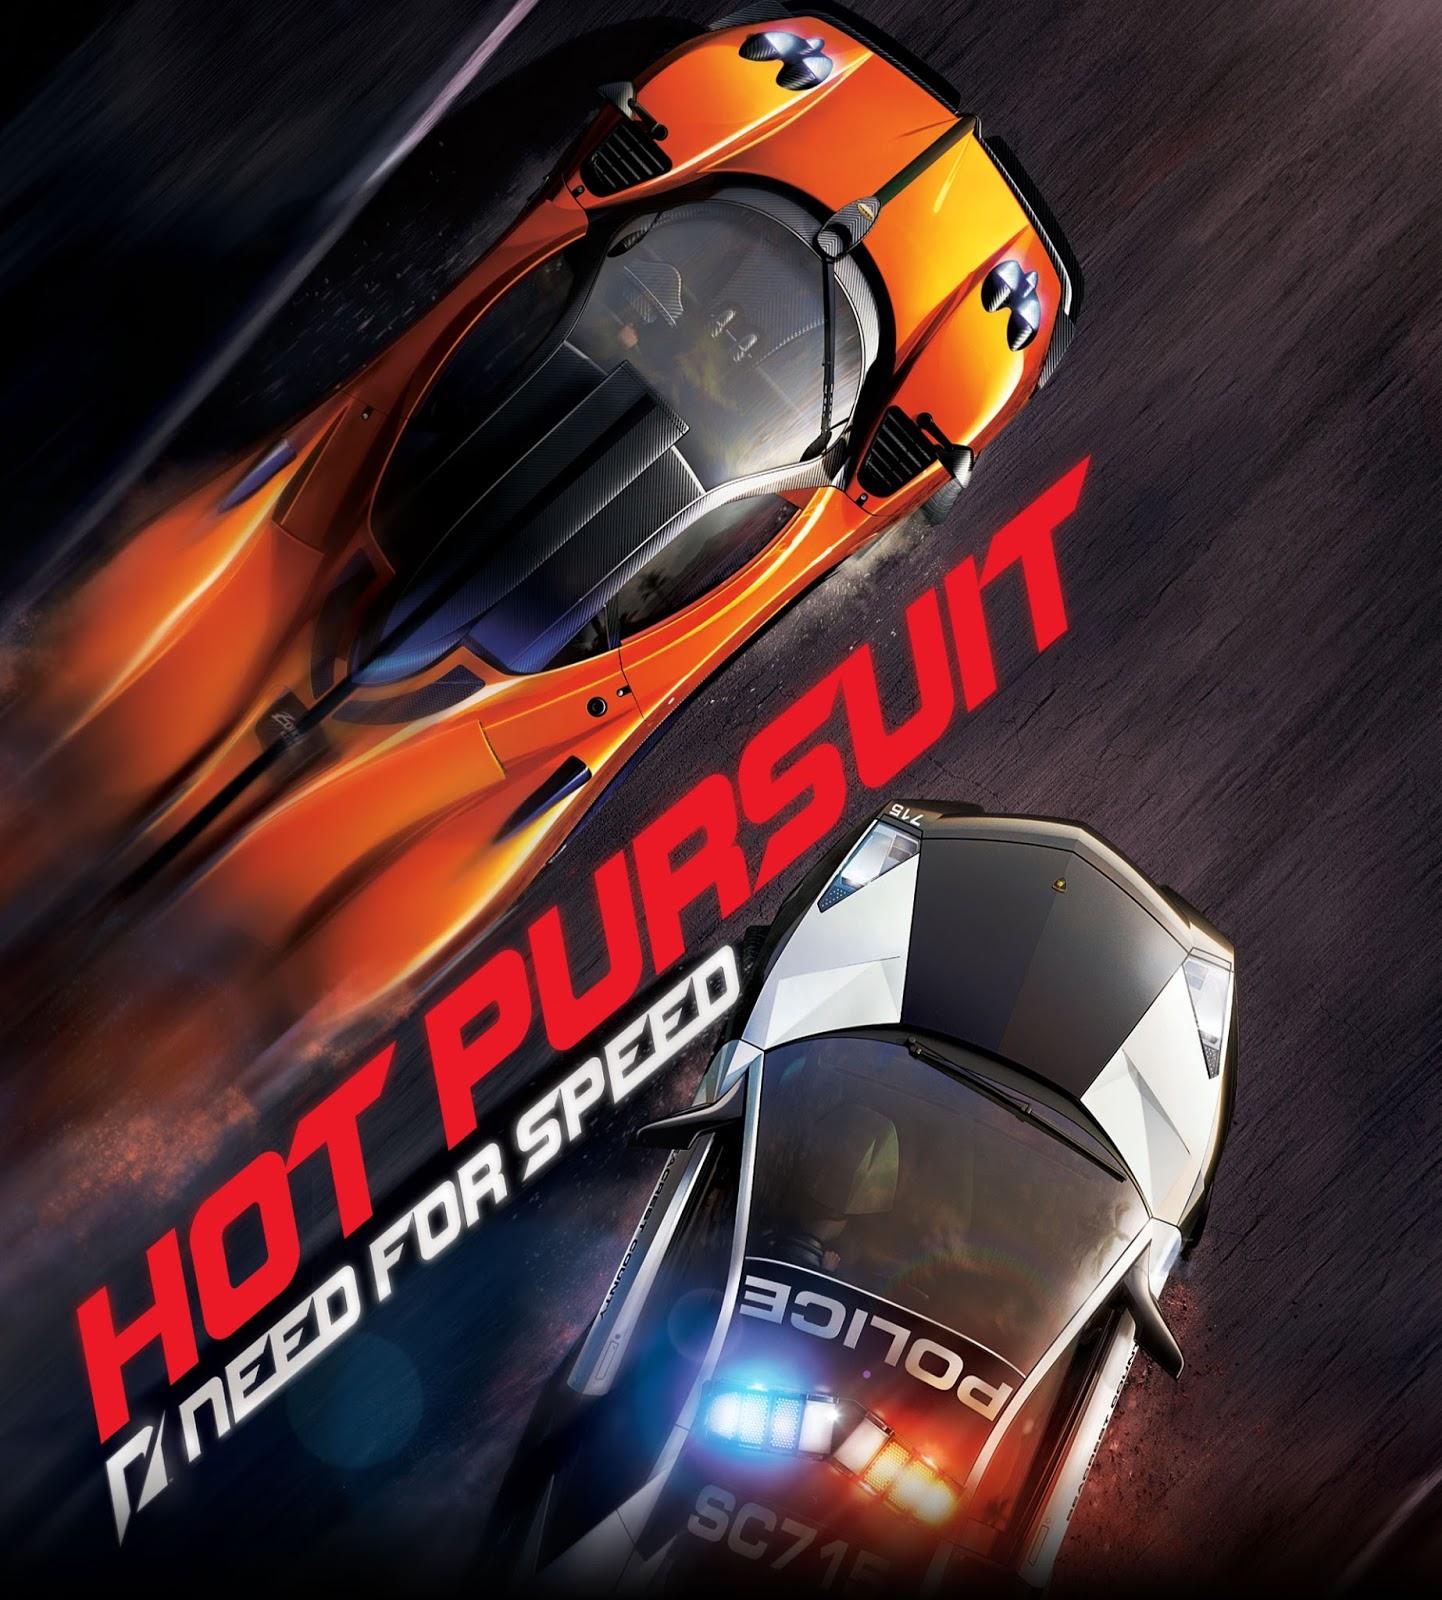 Hot Pursuit (2015) คู่ฮ็อตซ่าส์ ล่าให้ว่อง [HD][พากย์ไทย]